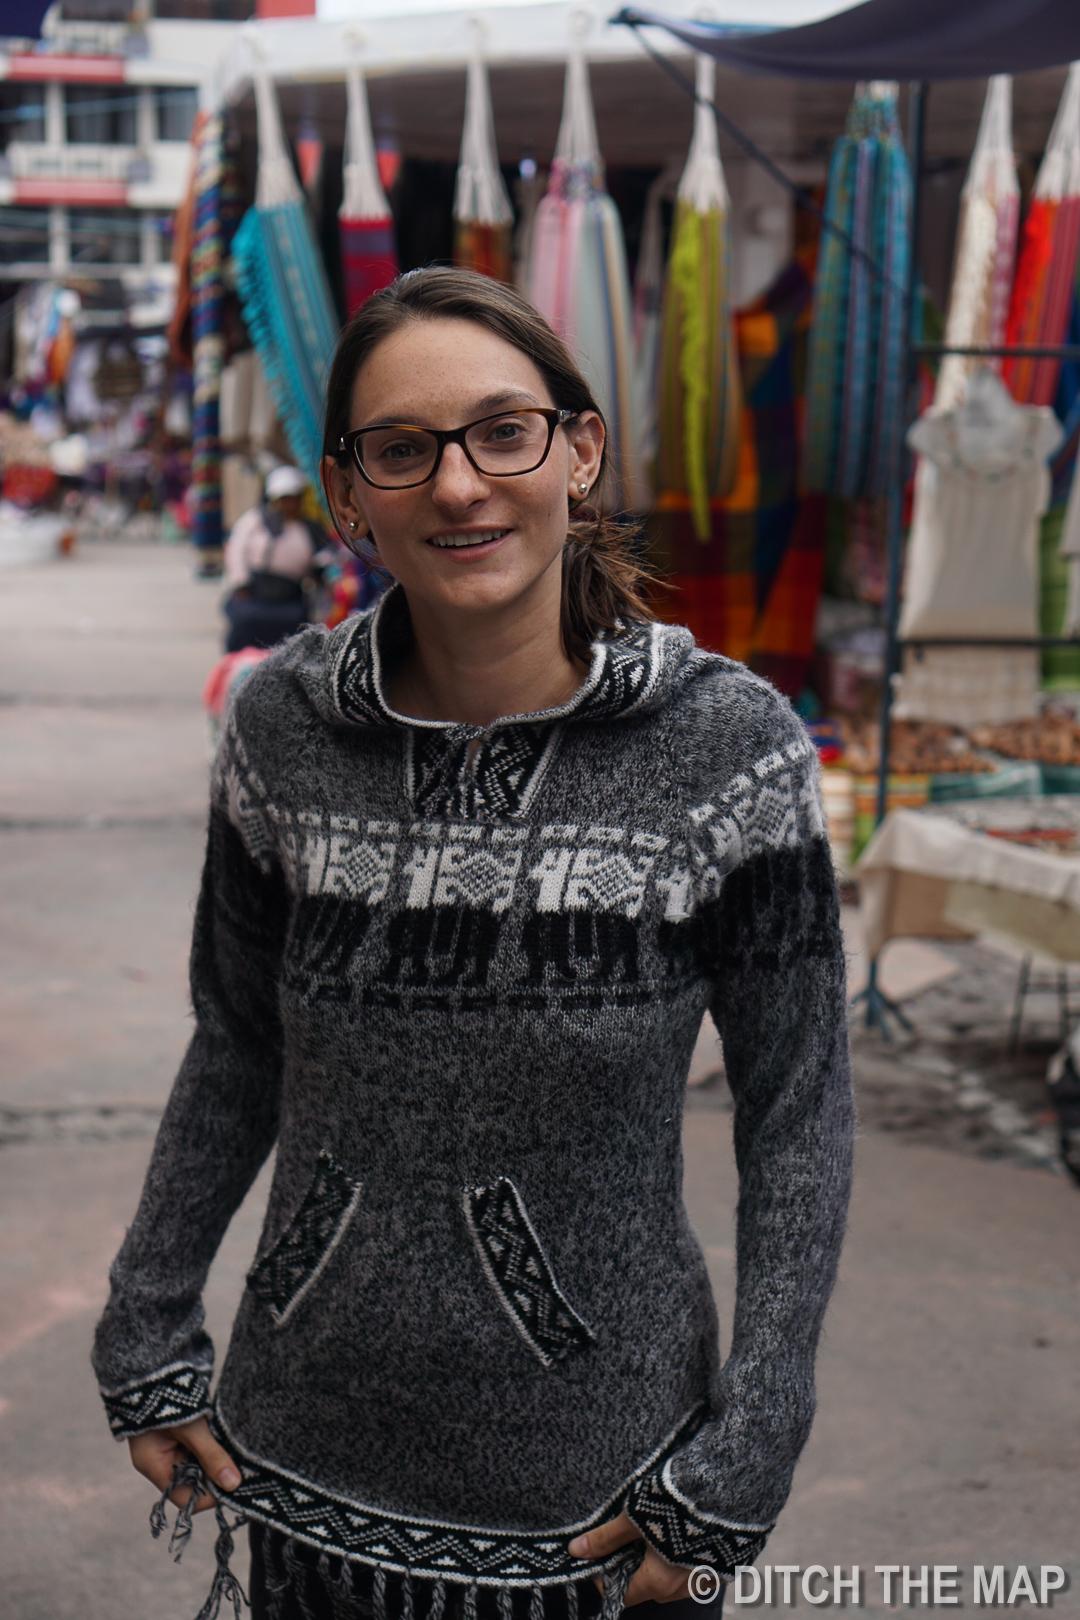 Sylvie tries on an alpaca sweater in Otavalo, Ecuador